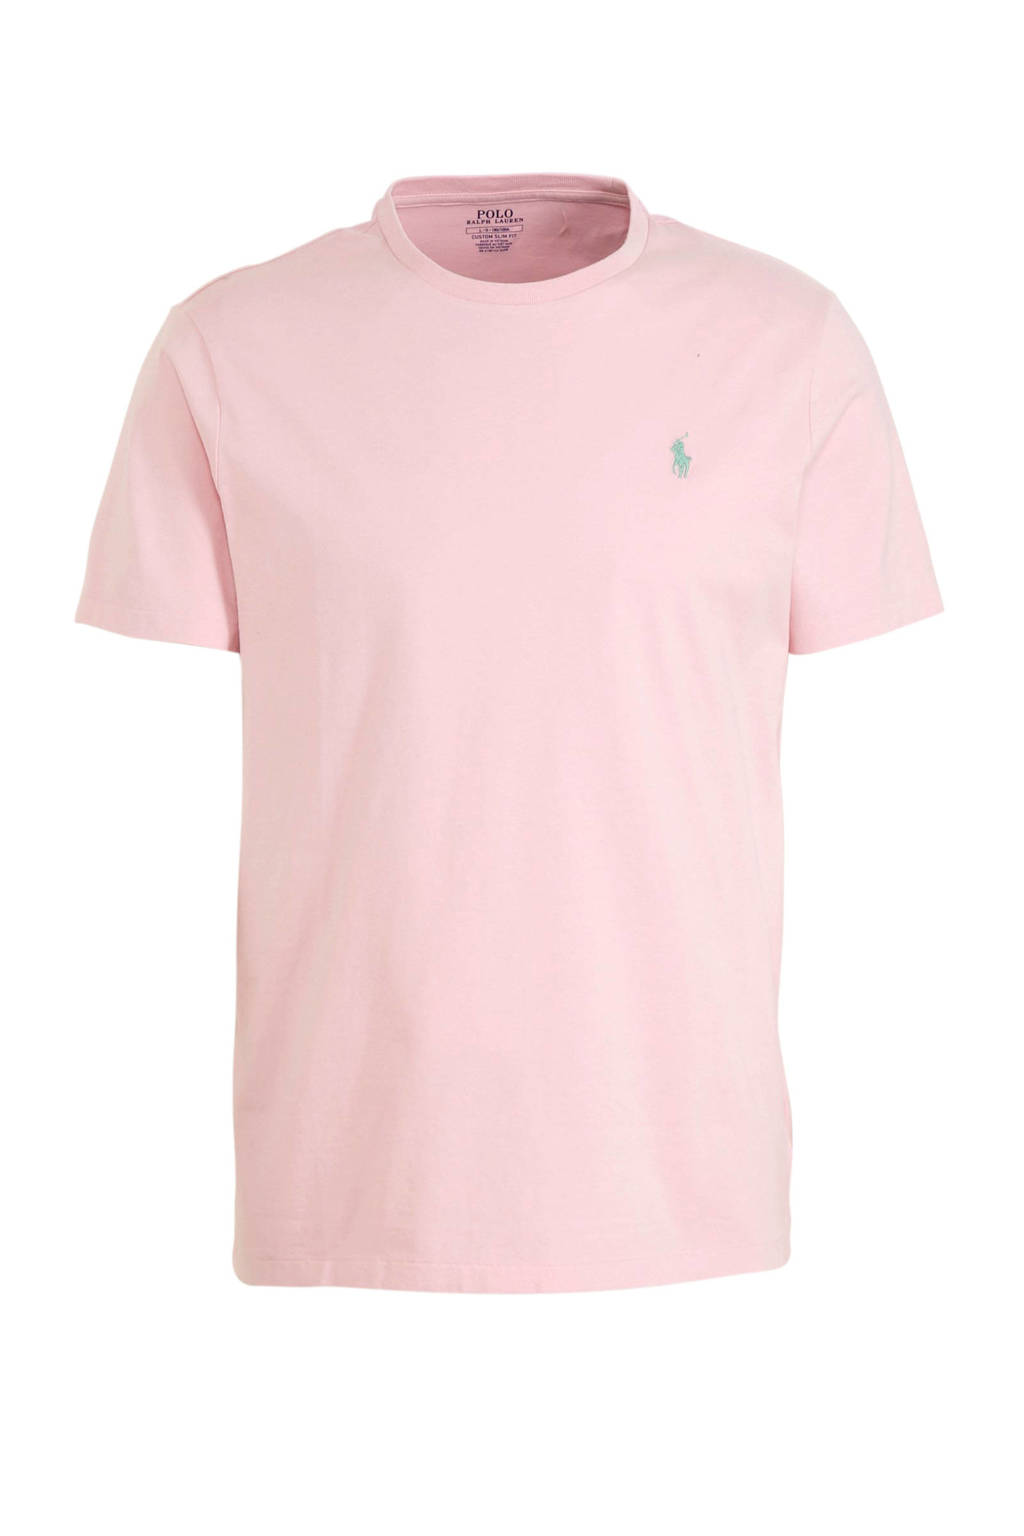 POLO Ralph Lauren T-shirt met logo zalm, Zalm